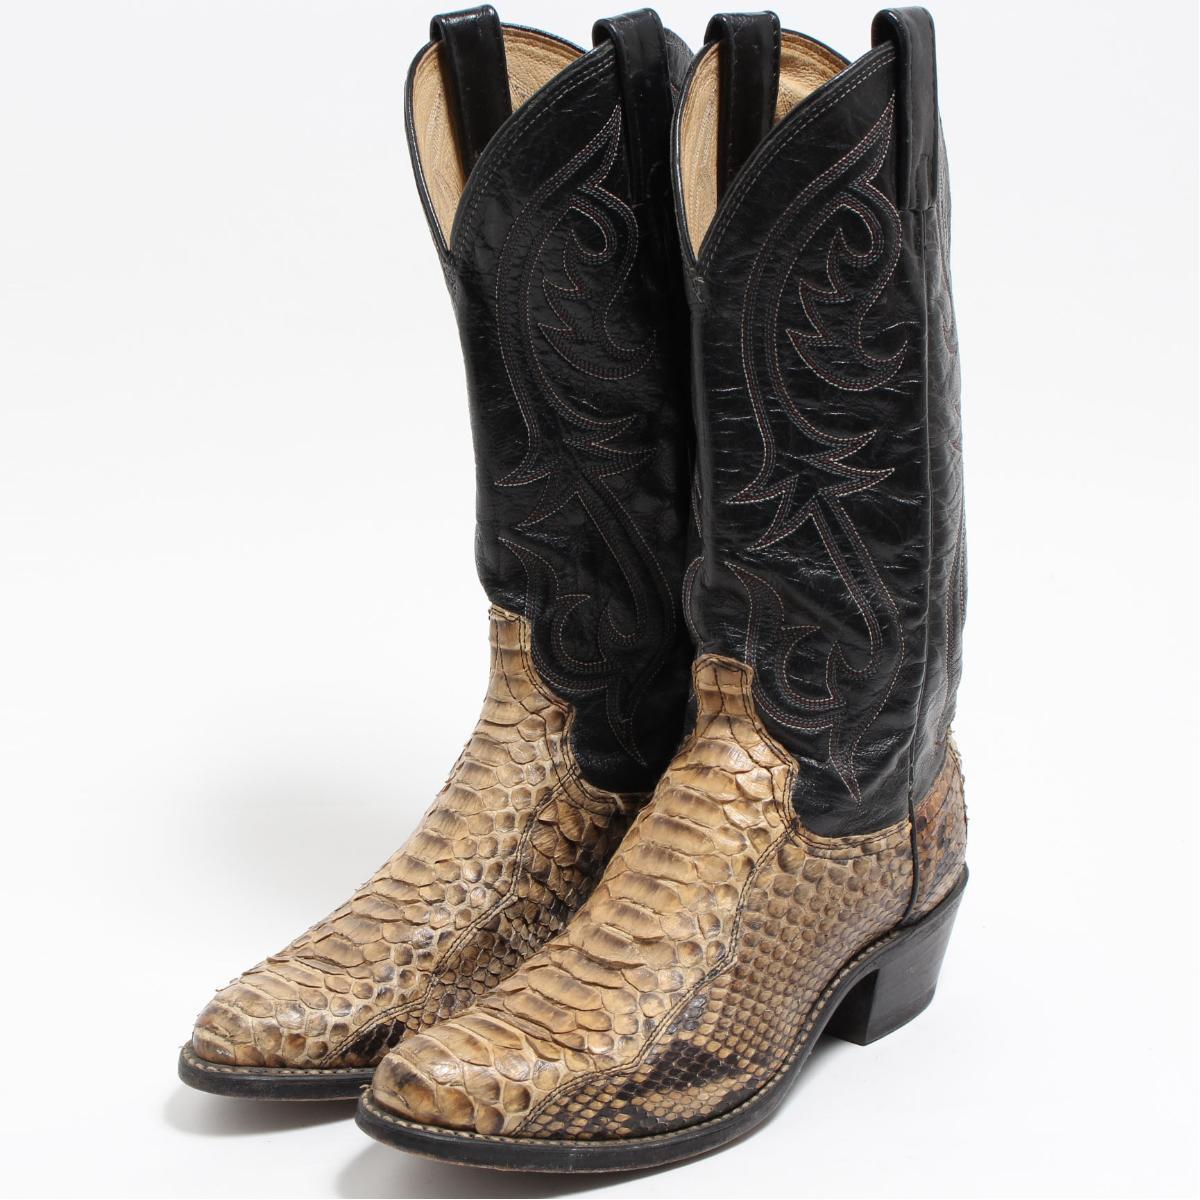 3961c4e6465 Lady's 23.0cm /boo7125 made in dingo DINGO python leather western boots USA